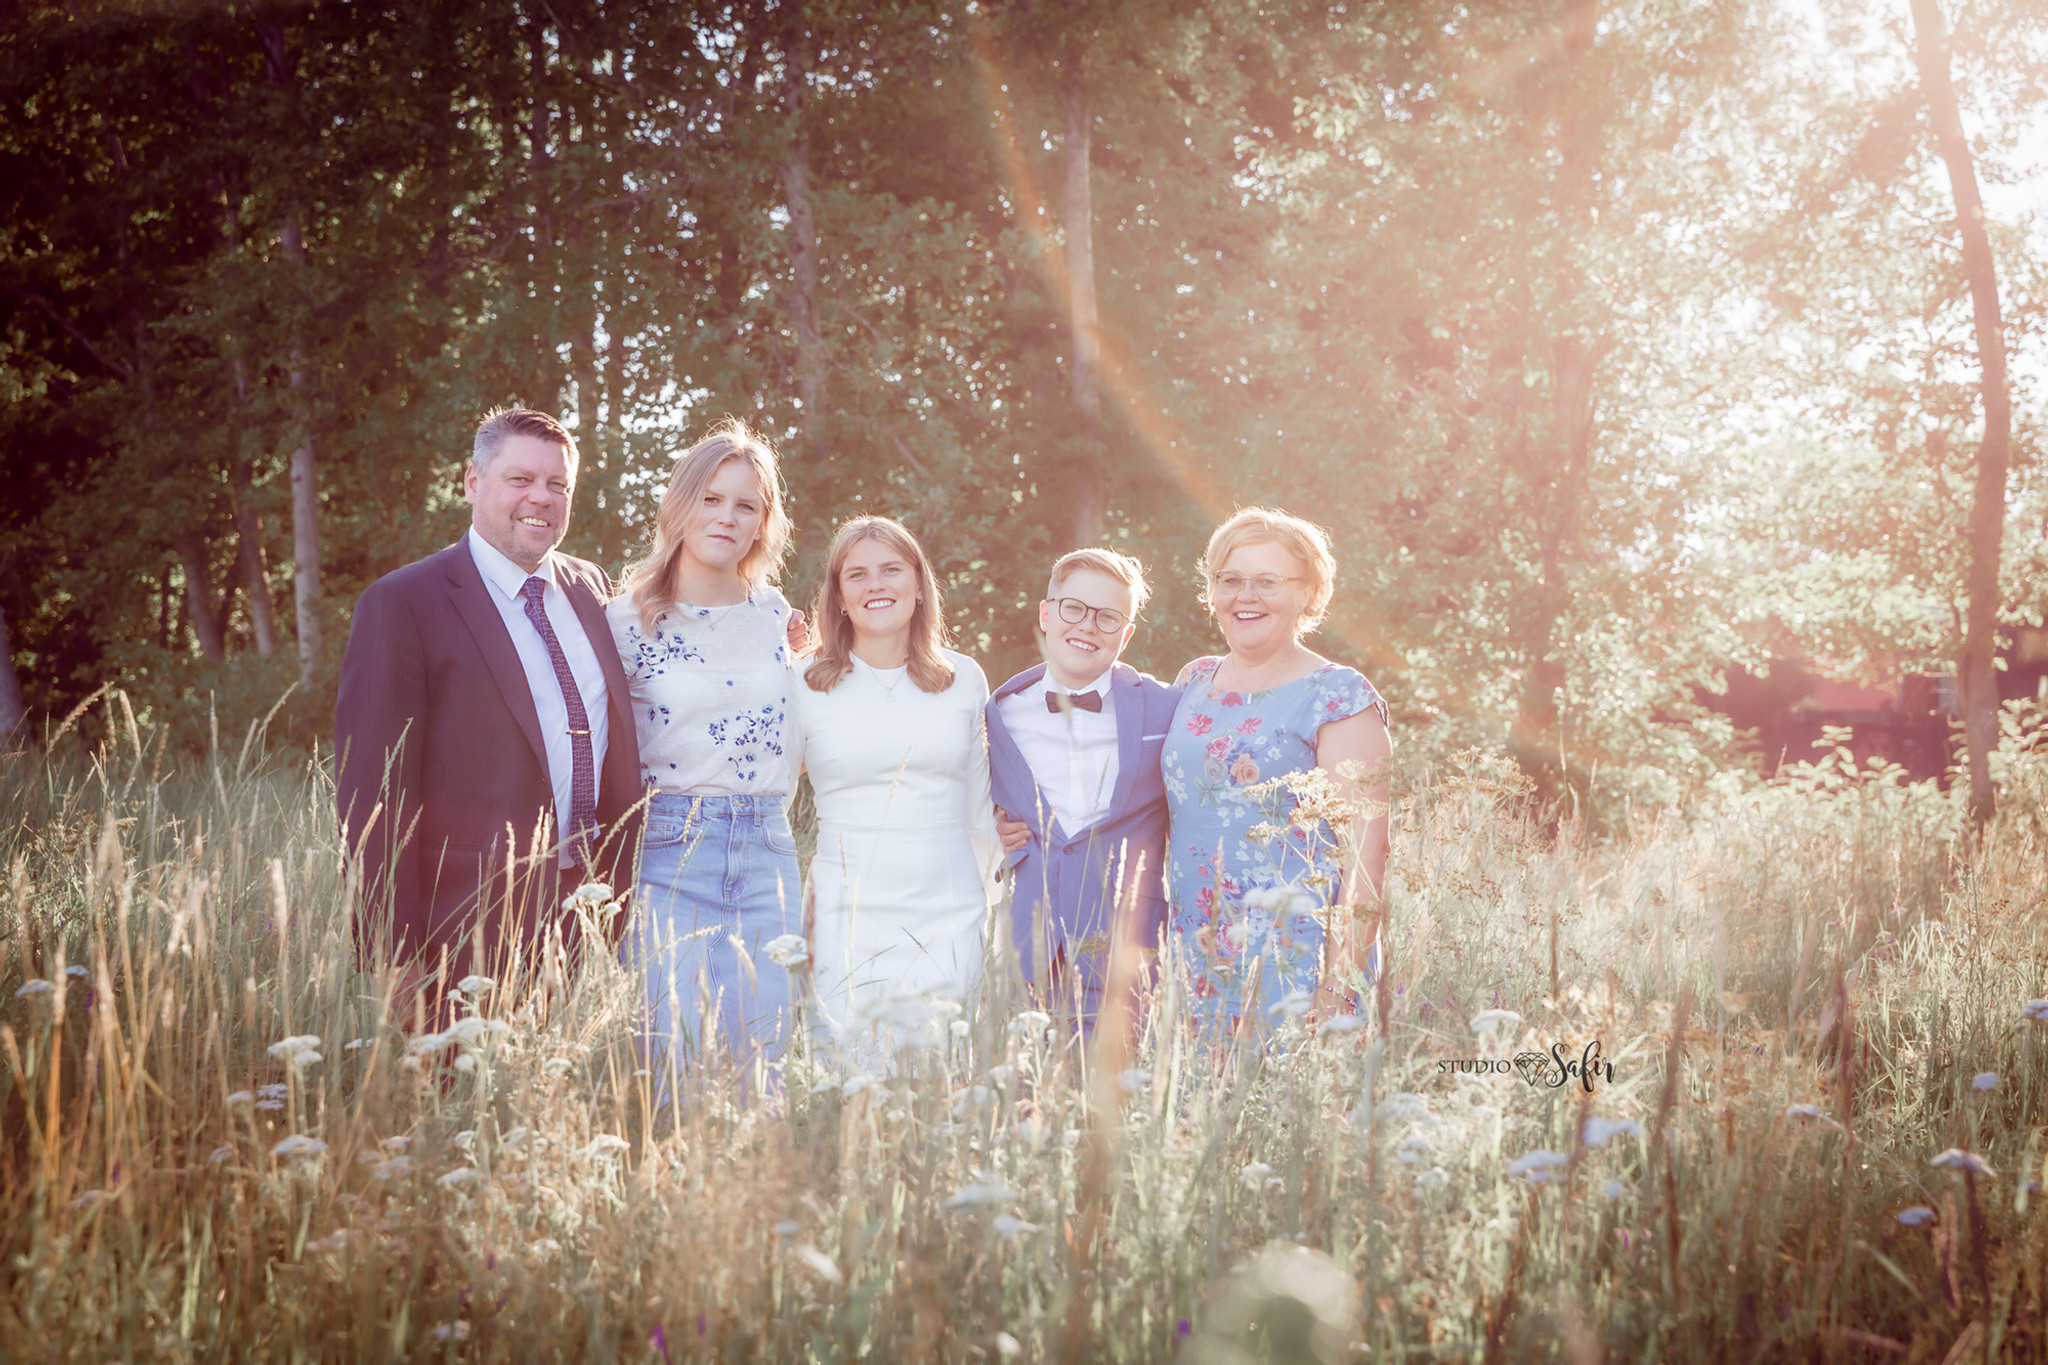 Perhekuvaus / Familjefotografering